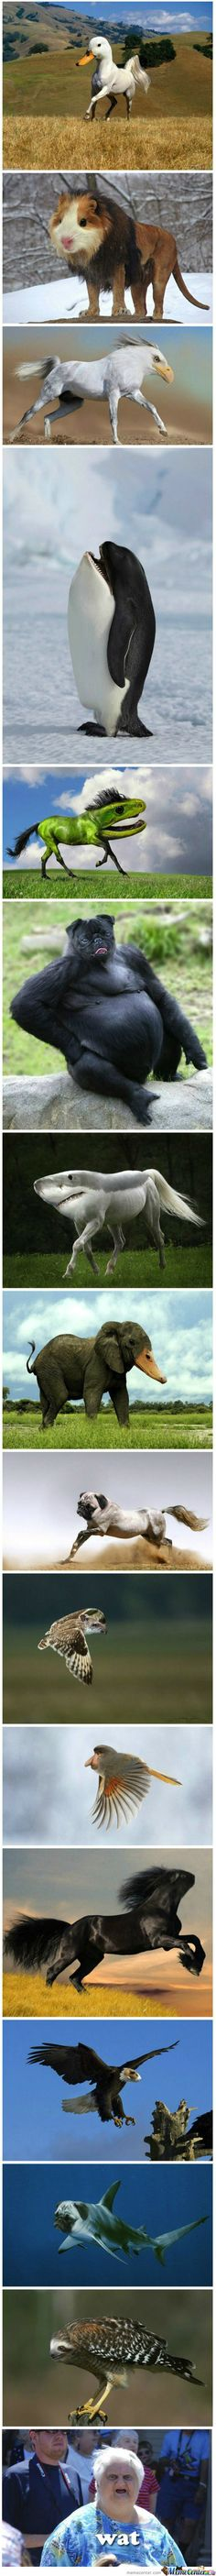 Animal face swaps